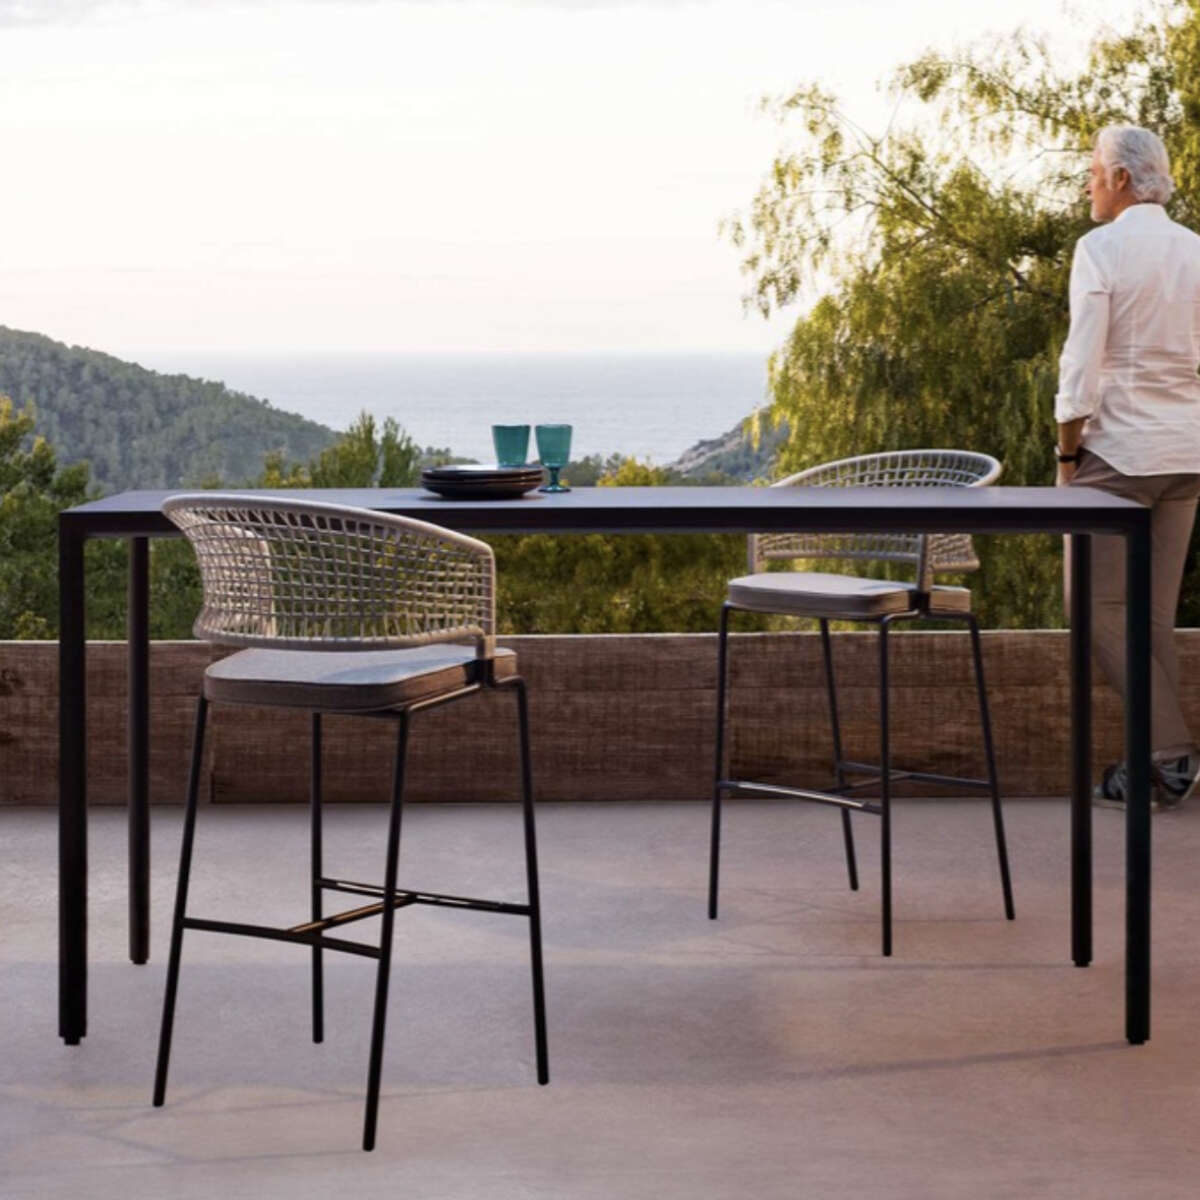 Illum Bar table ambient